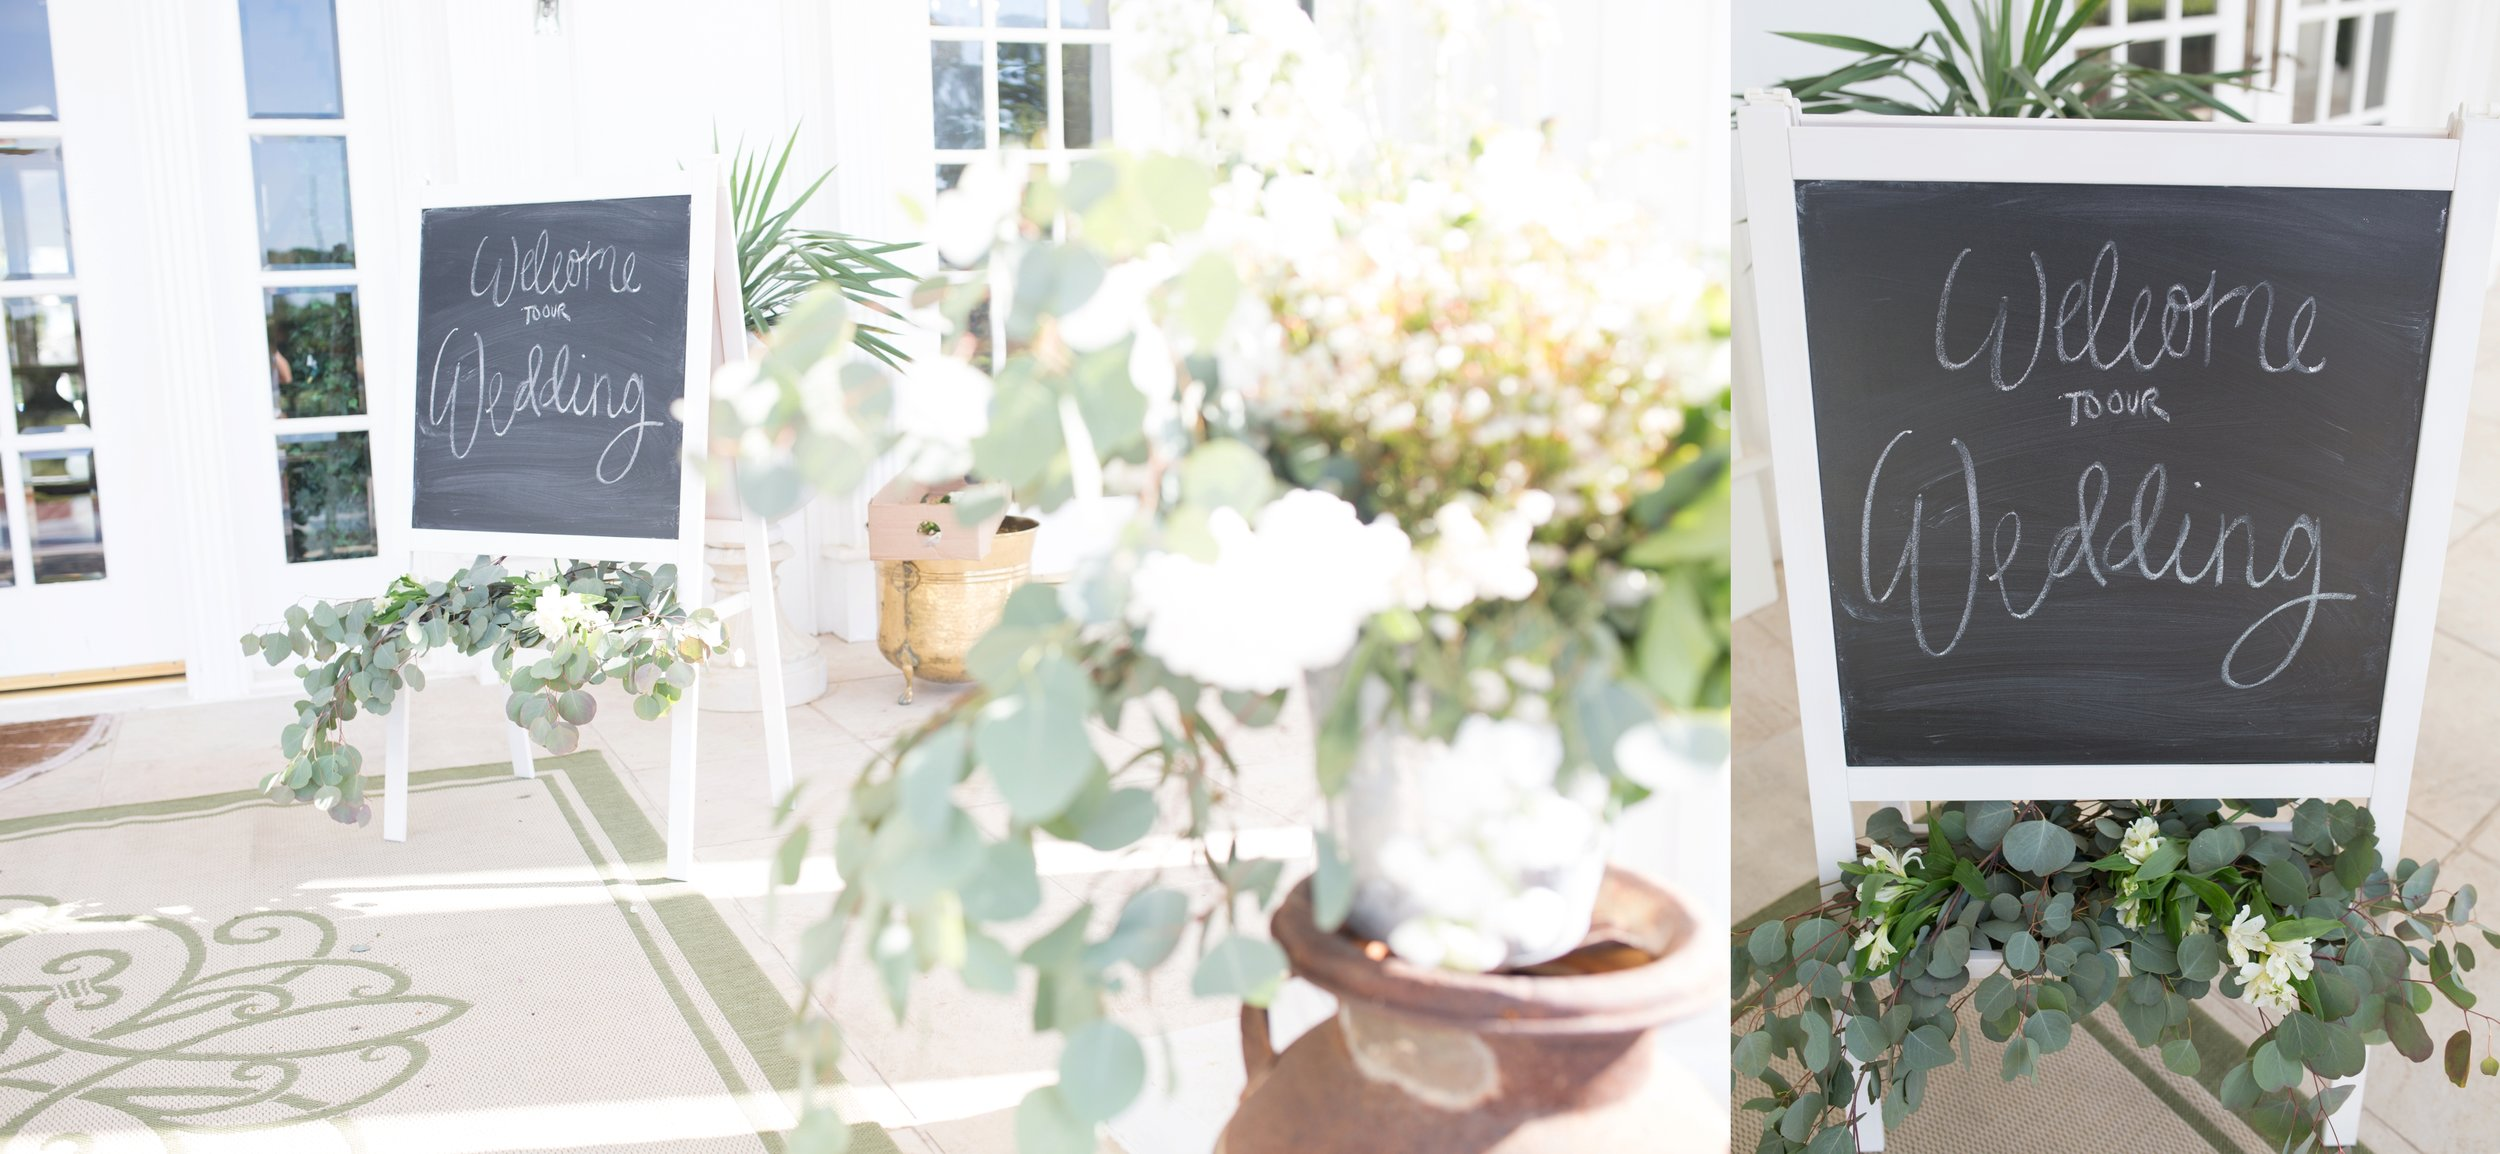 Lonestar-Mansion-Fort-Worth-Wedding-Planner-Burleson-Wedding-Venue_18.jpg